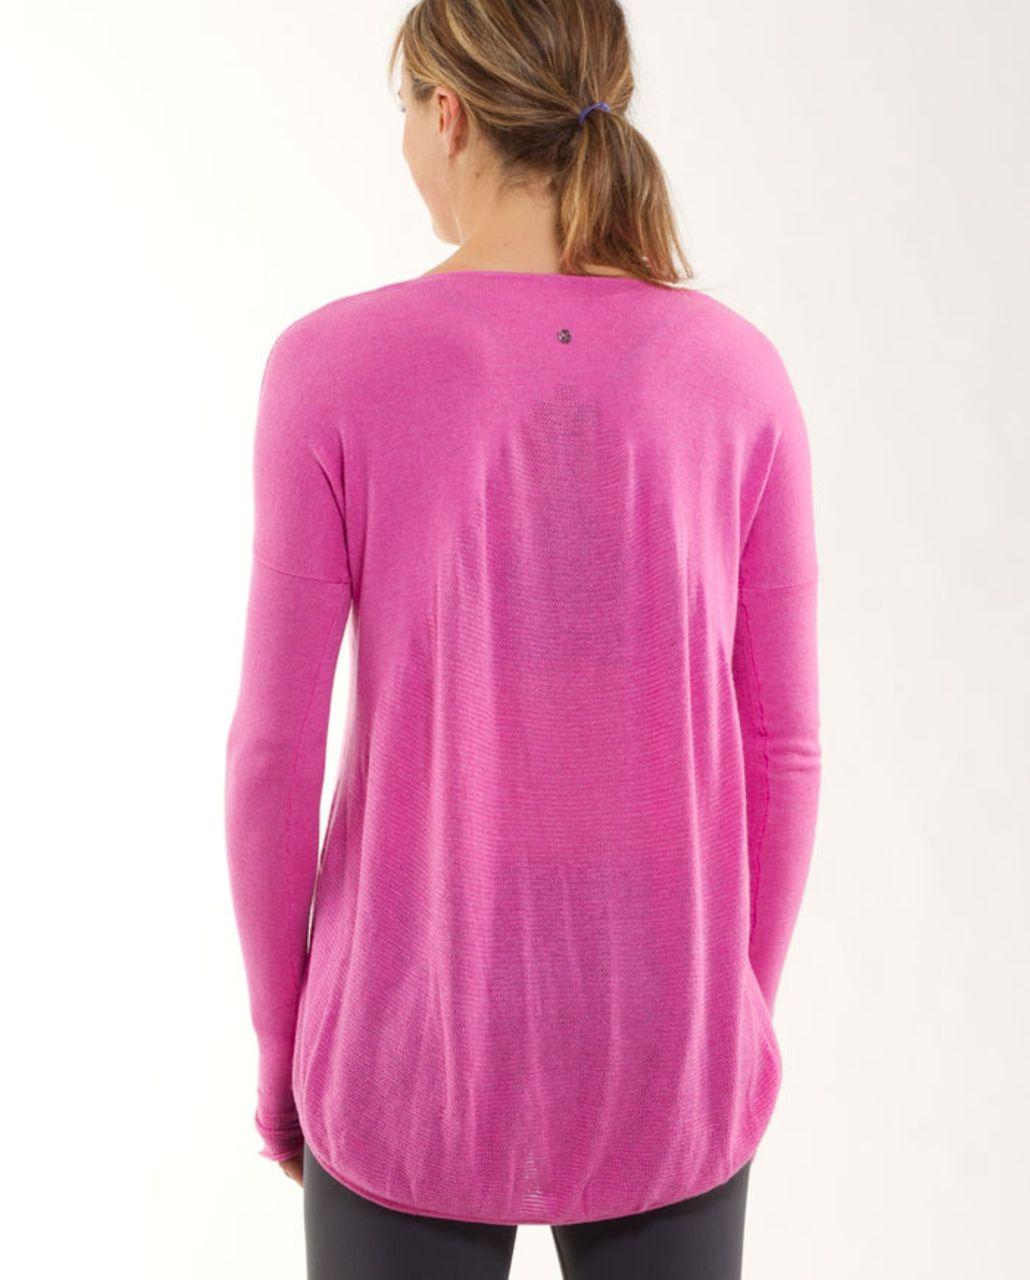 Lululemon Yoga Cozy Pullover - Heathered Smoky Rose